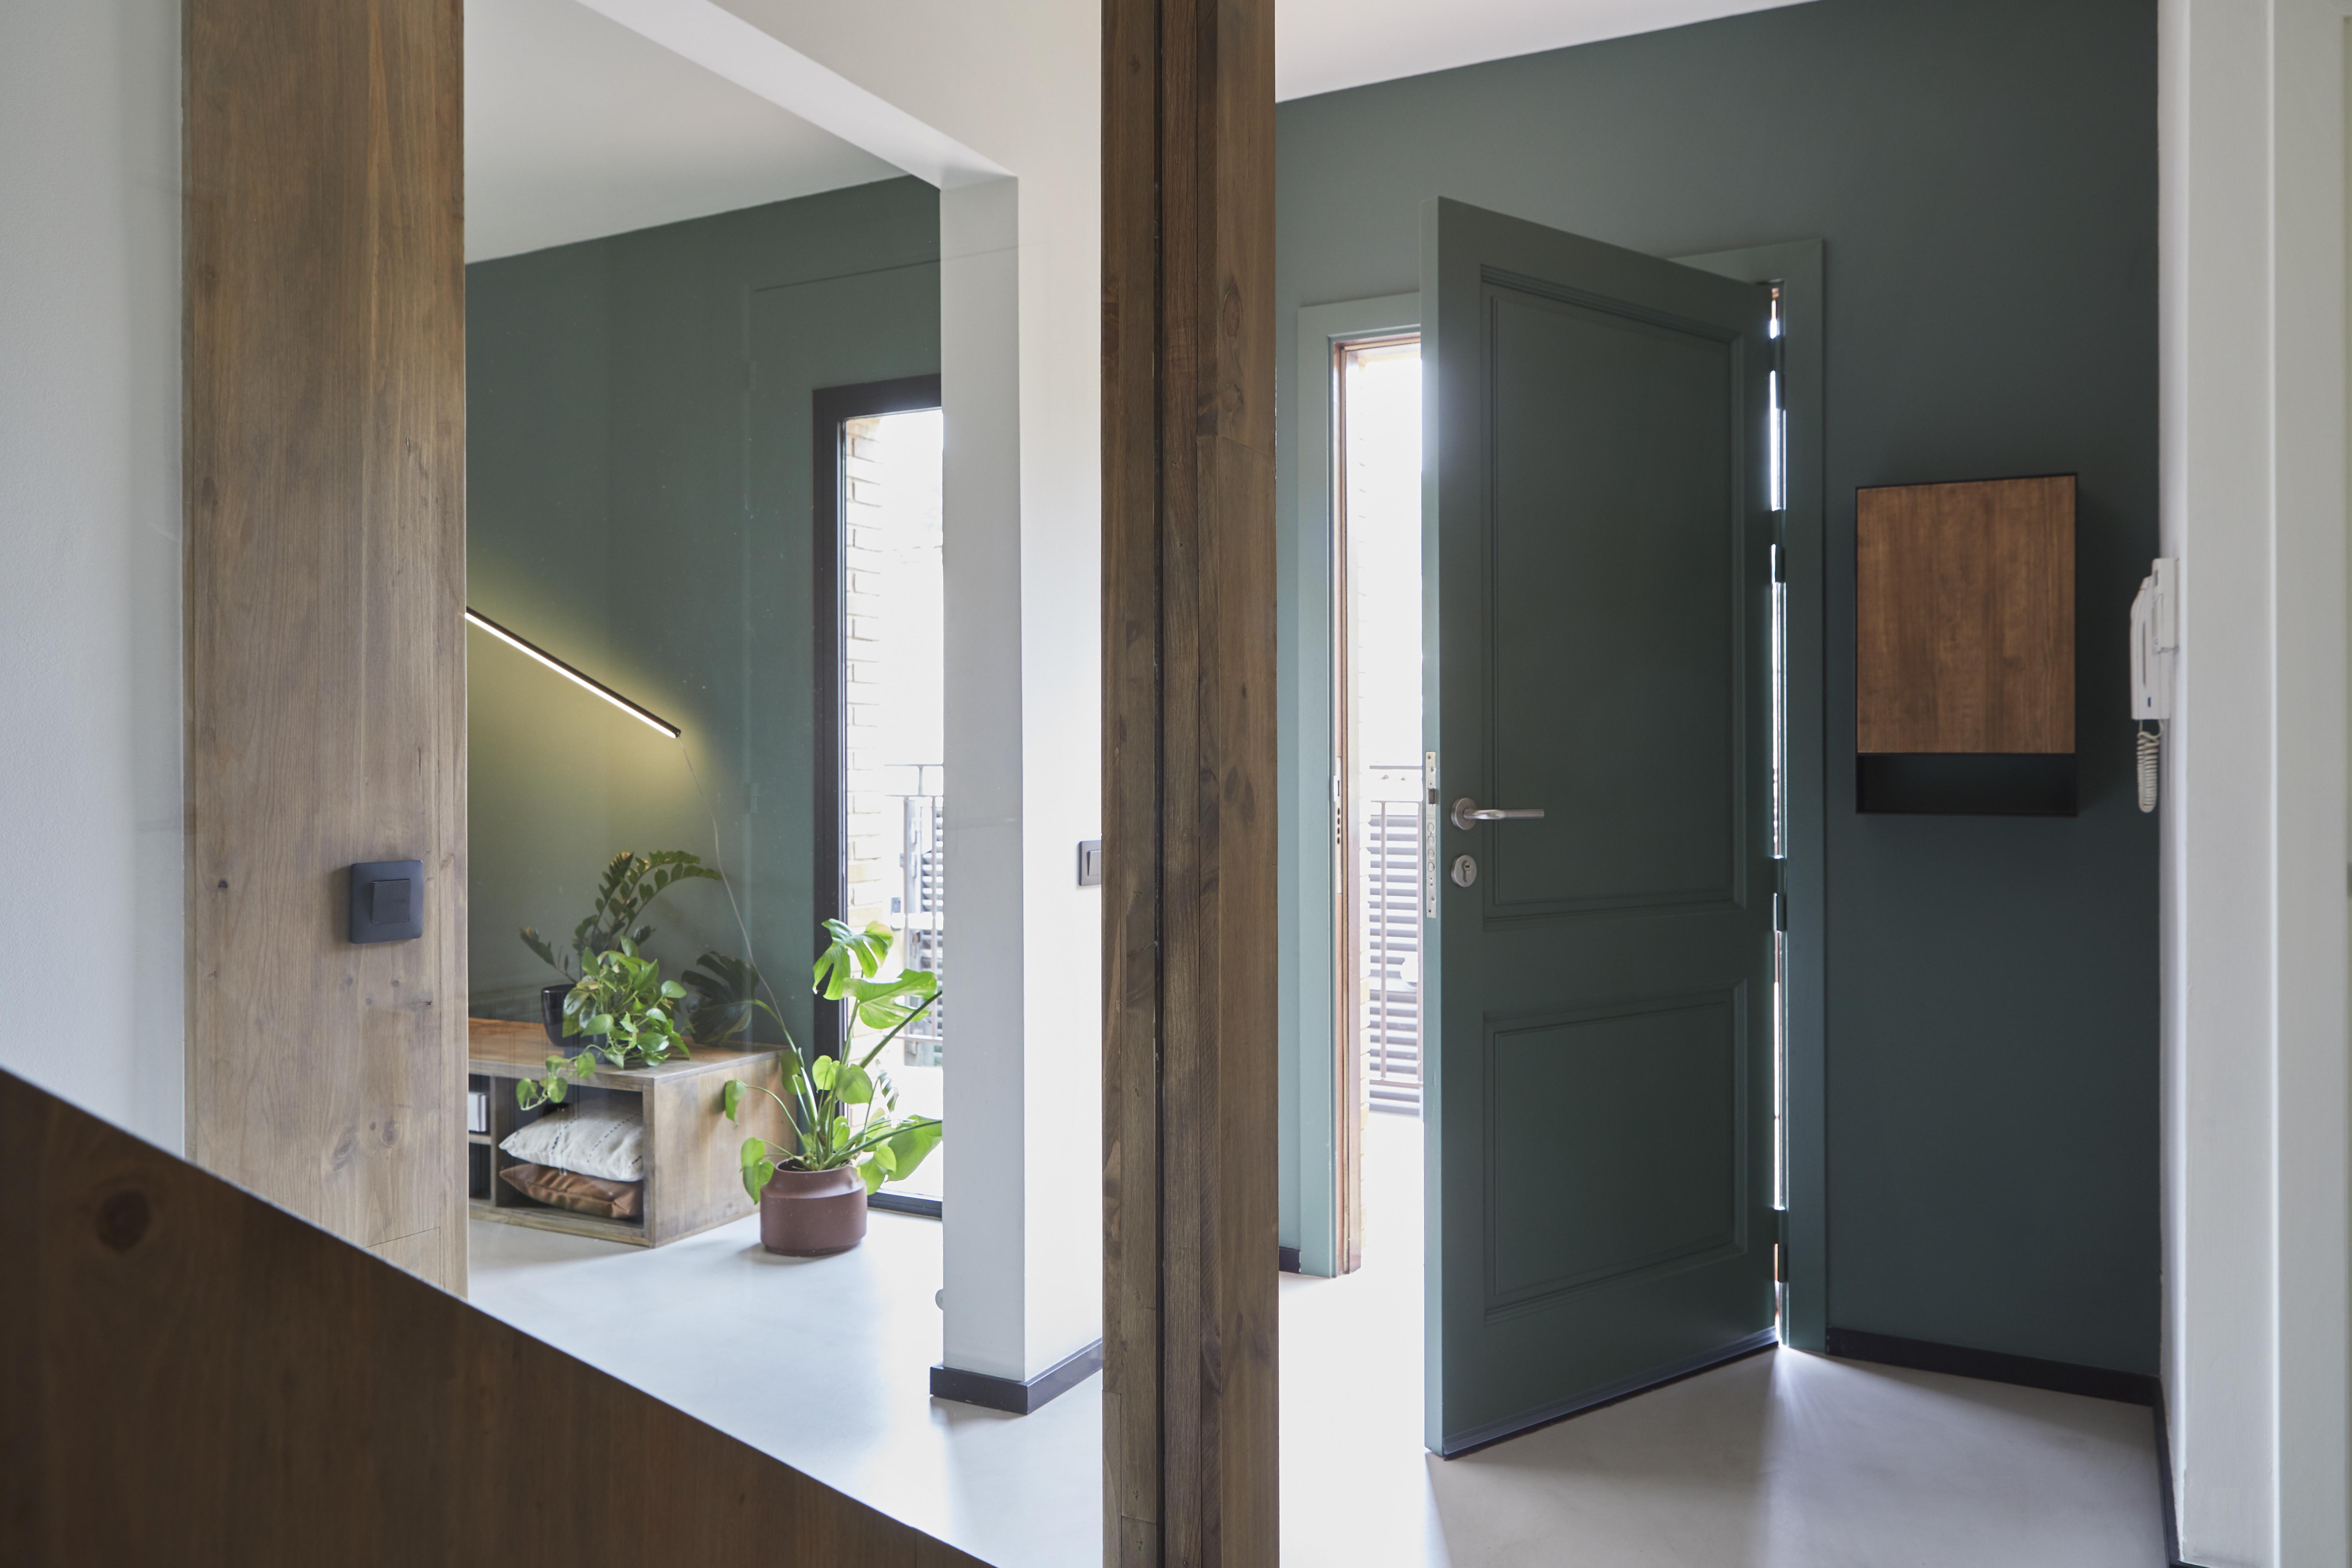 A porta, também verde